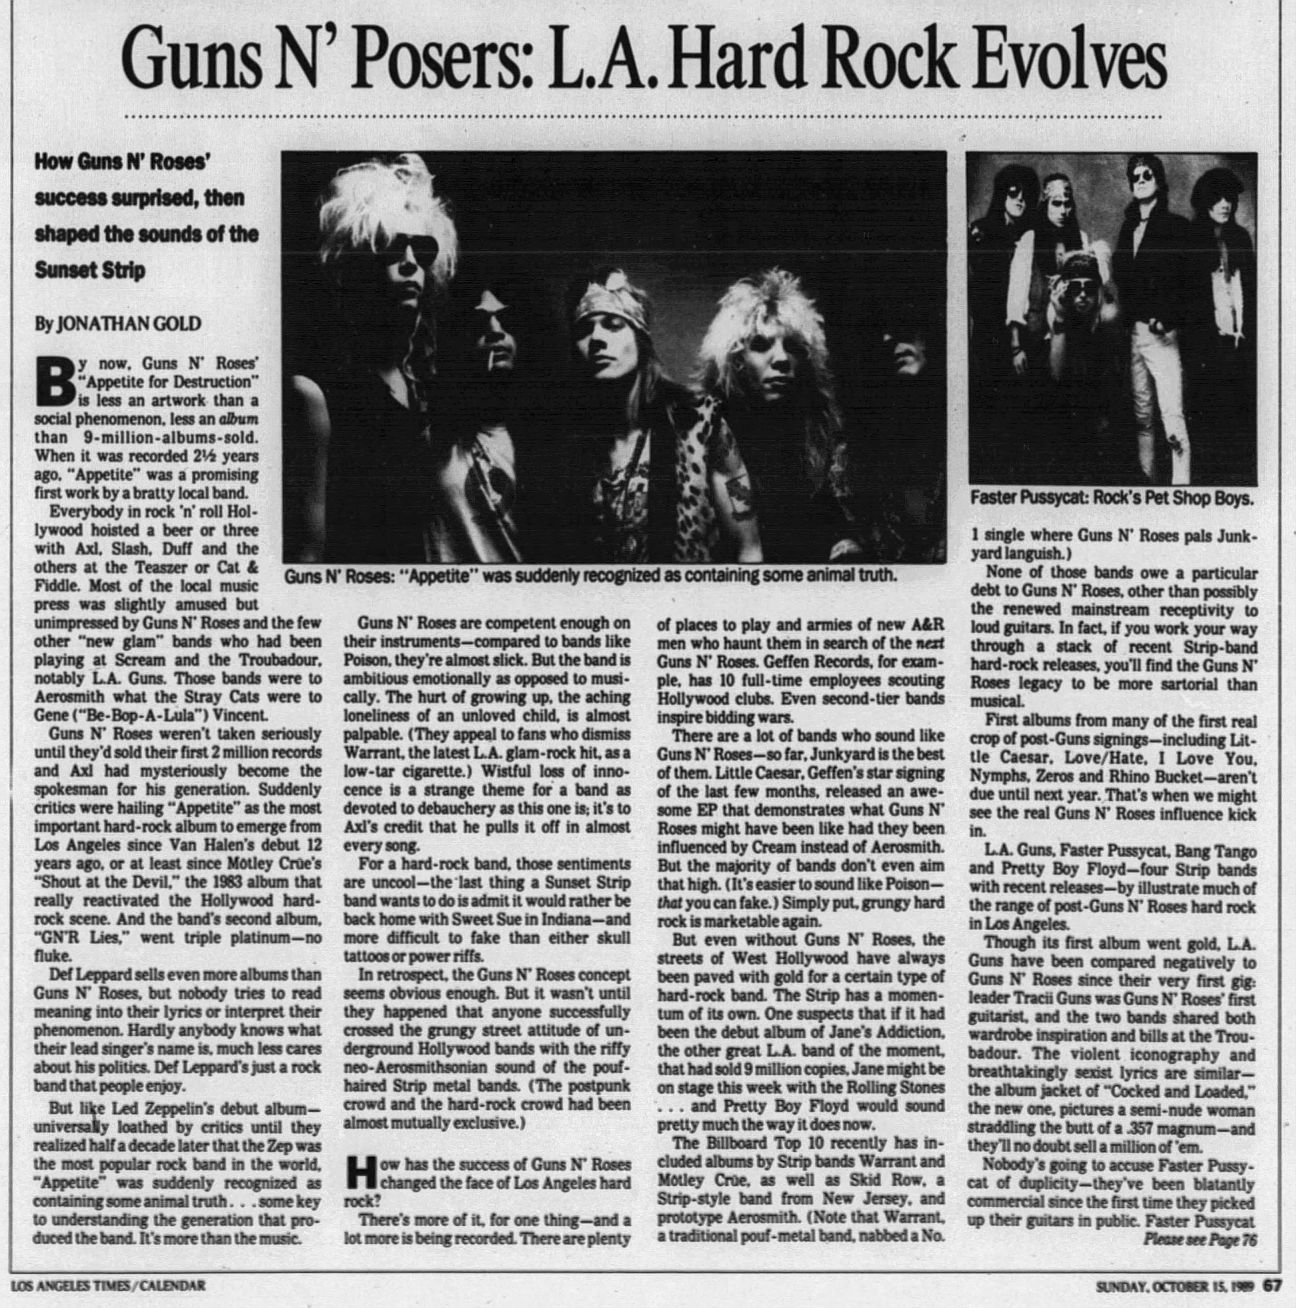 1989.10.15 - Los Angeles Times - Guns N' Posers: L.A. Hard Rock Evolves QaBDtVyn_o